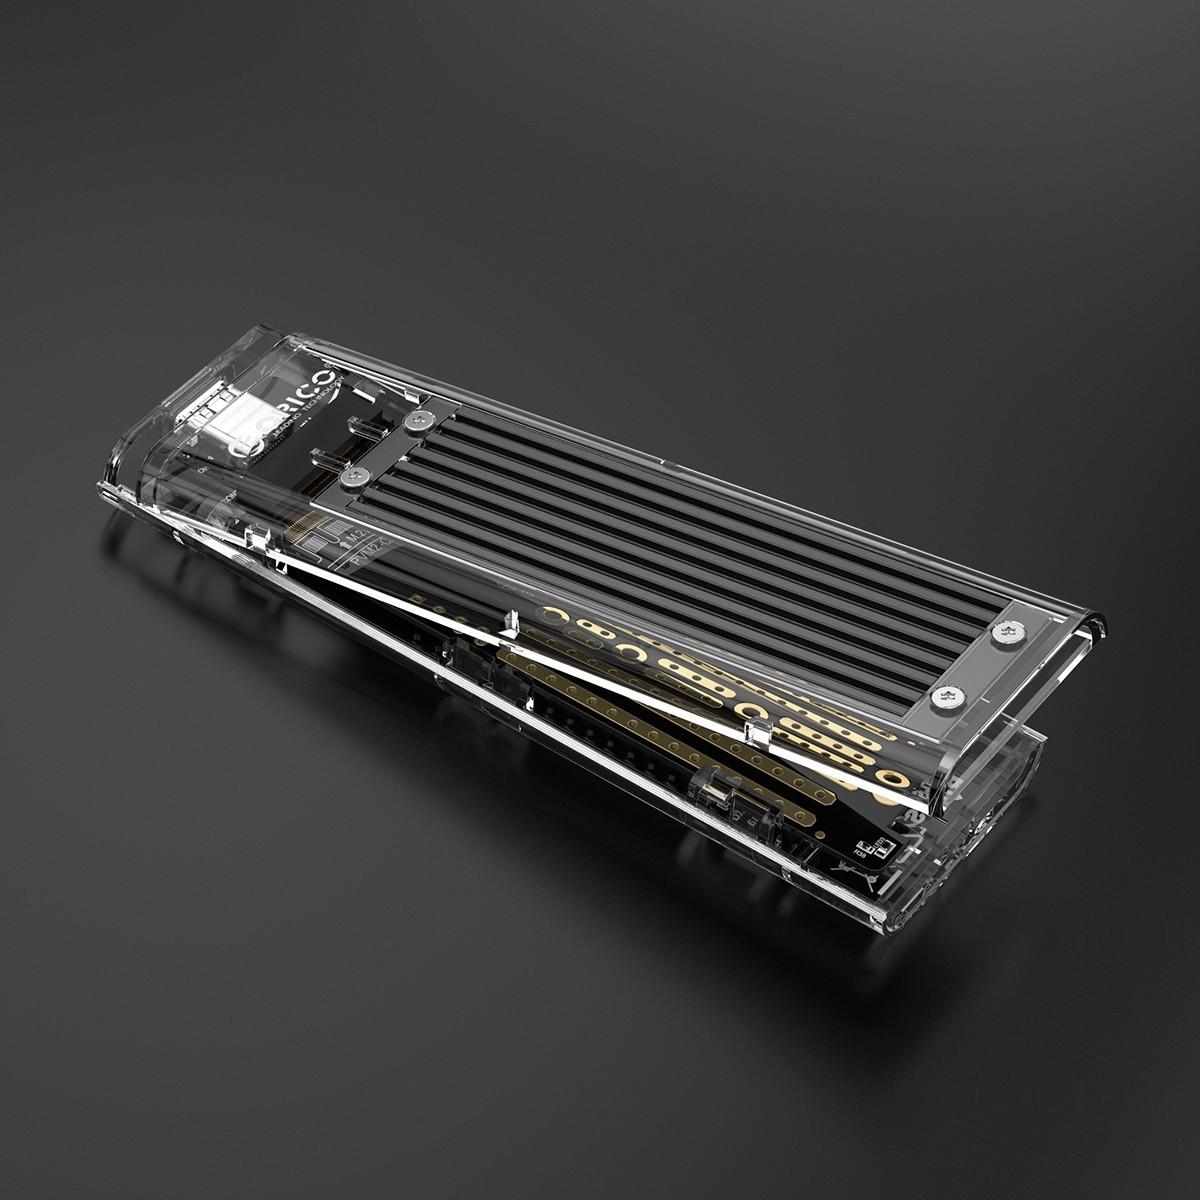 Case Externo para SSD M.2 NGFF - USB3.1 Type-C - TCM2F-C3